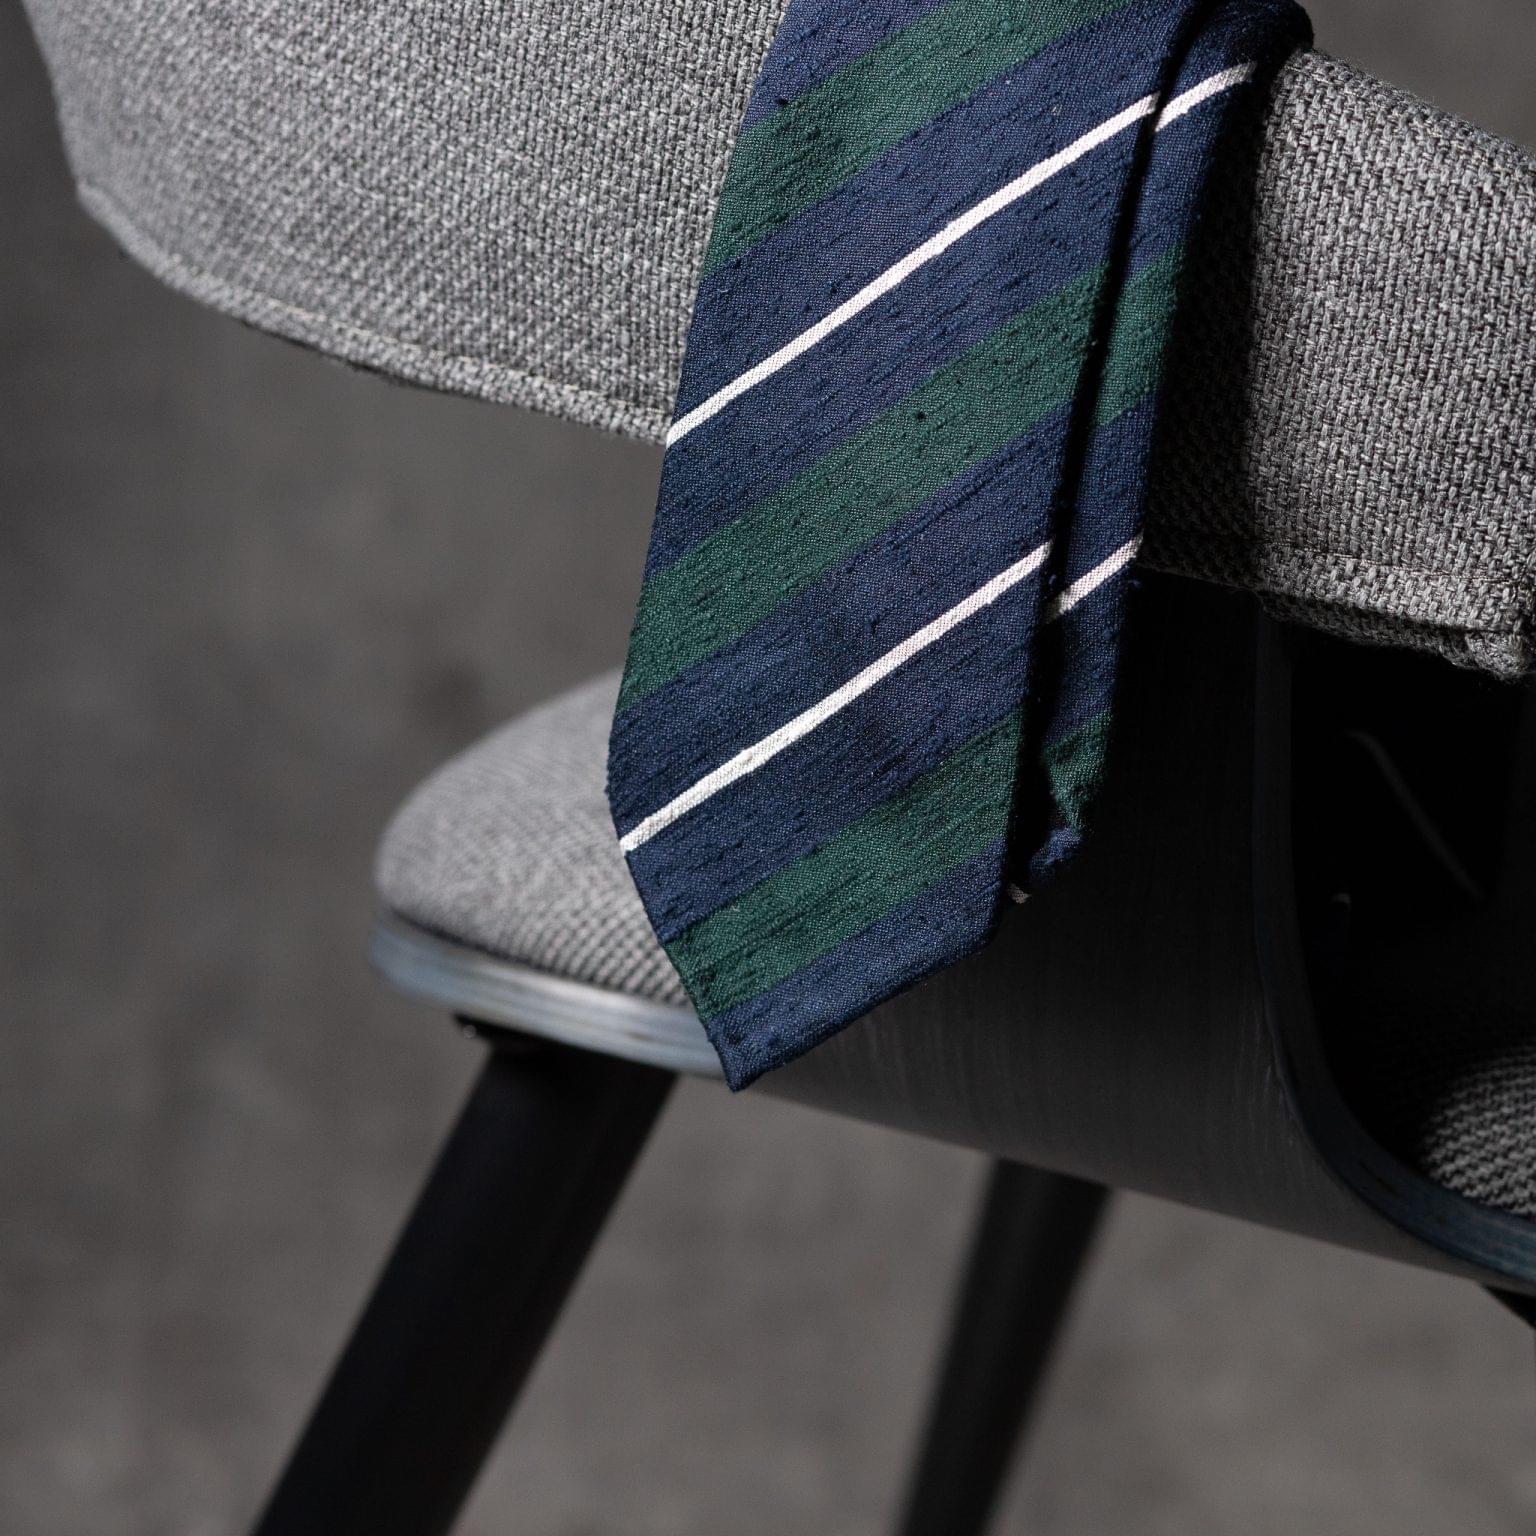 SHANTUNG-0526-Tie-Initials-Corbata-Iniciales-The-Seelk-2